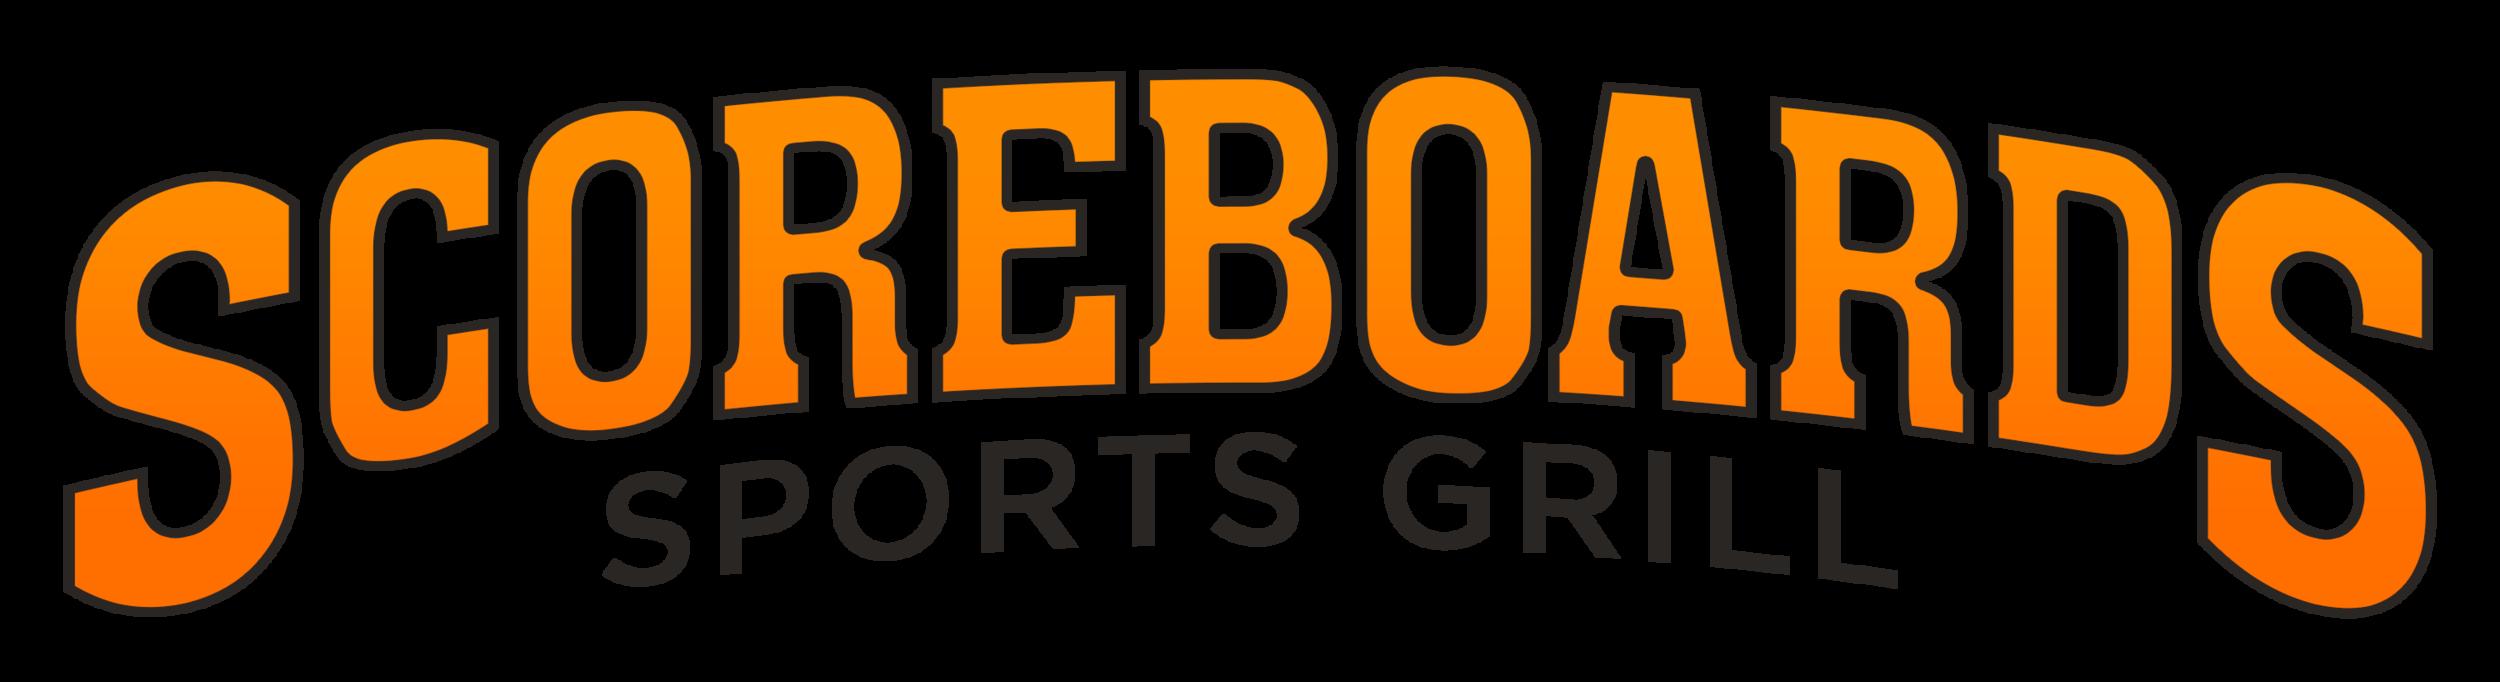 Scoreboards Logo CLB.png